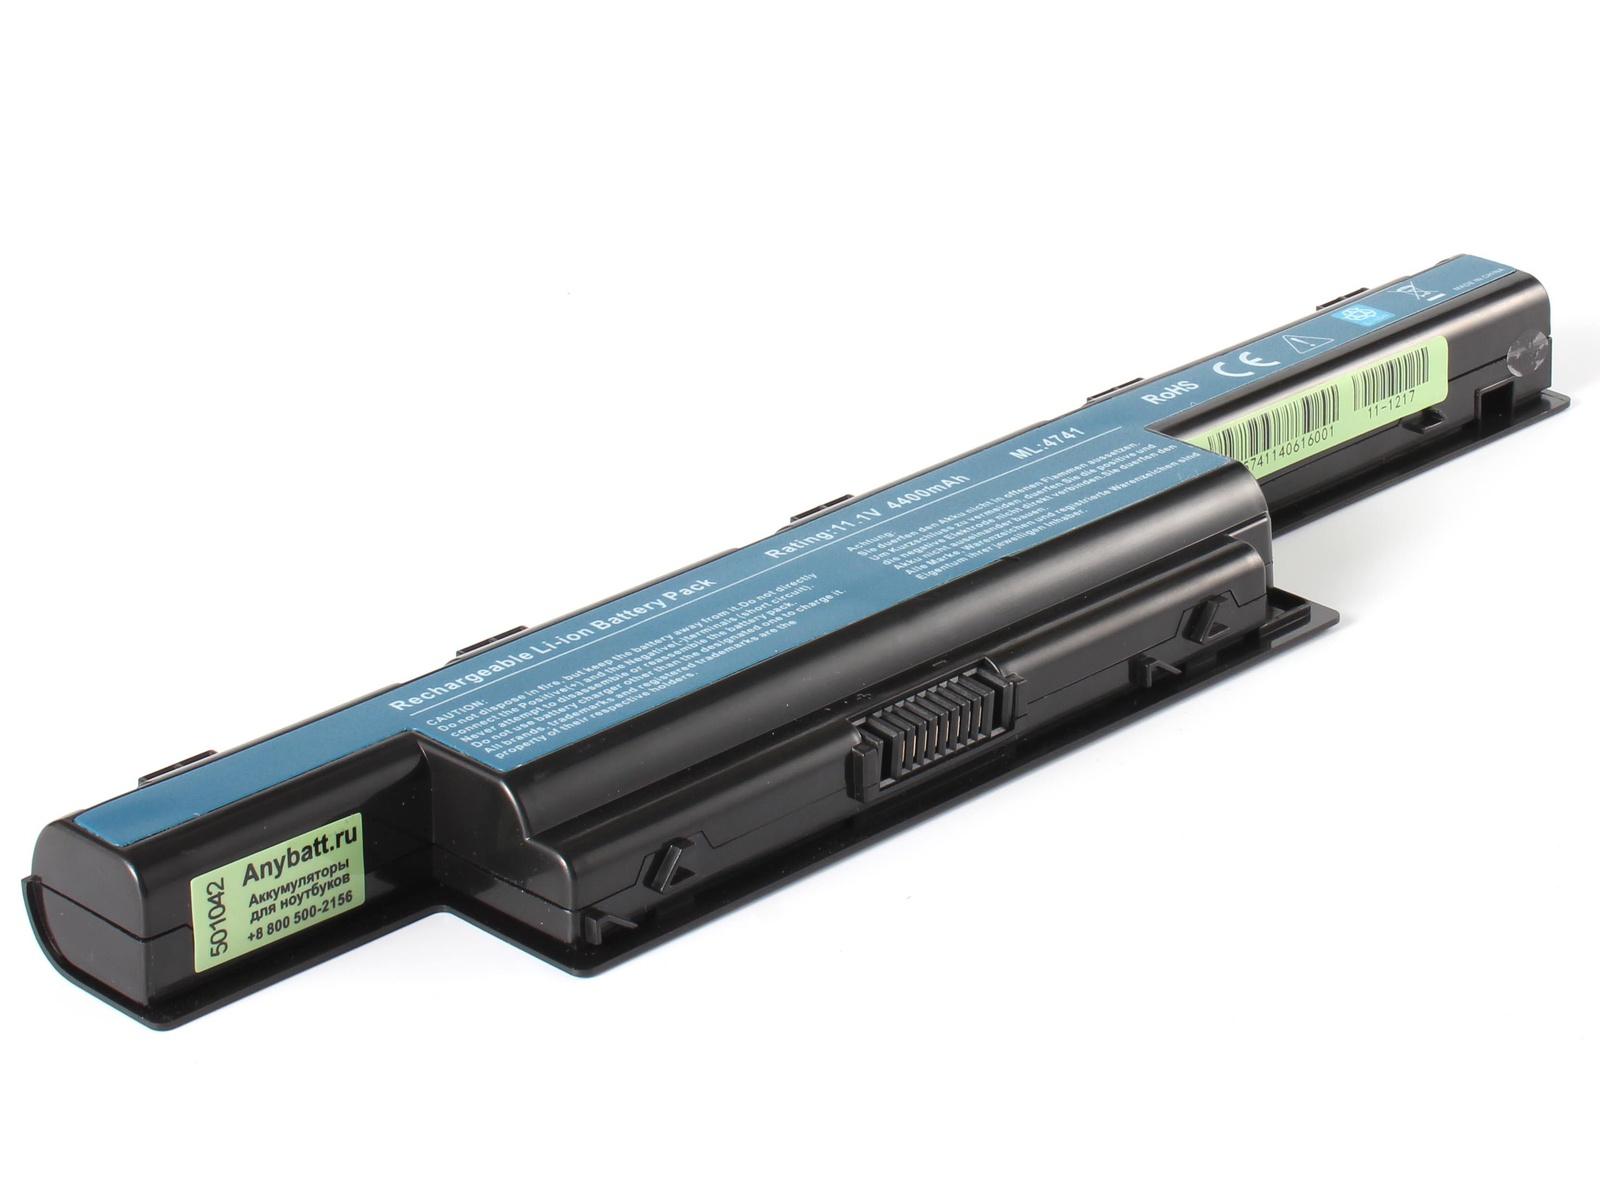 Аккумулятор для ноутбука AnyBatt для Acer Aspire 5750G-2414G50Mnkk, Aspire 5750G-2454G50Mnrr, Aspire E1-570-33214G50Mn, Aspire 4253G, Aspire 5552G-P323G25Mikk, Aspire 5750G-2354G32Mnkk, TravelMate P643, Aspire E1-571G-33124G50Mnks AnyBatt